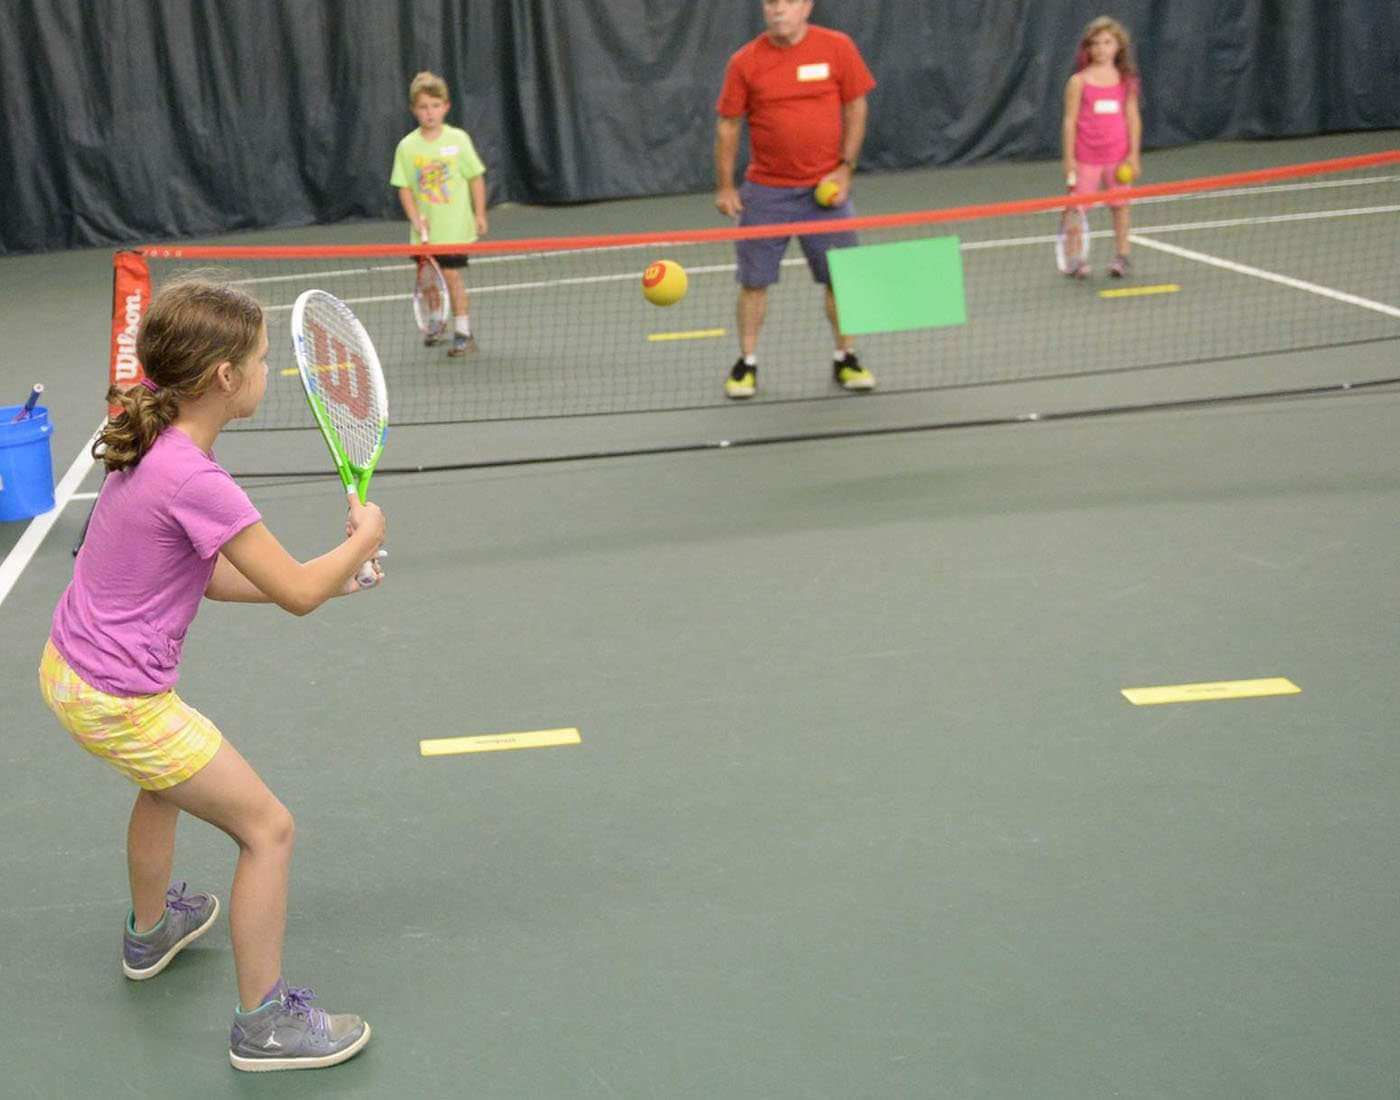 Soft Tennis sports